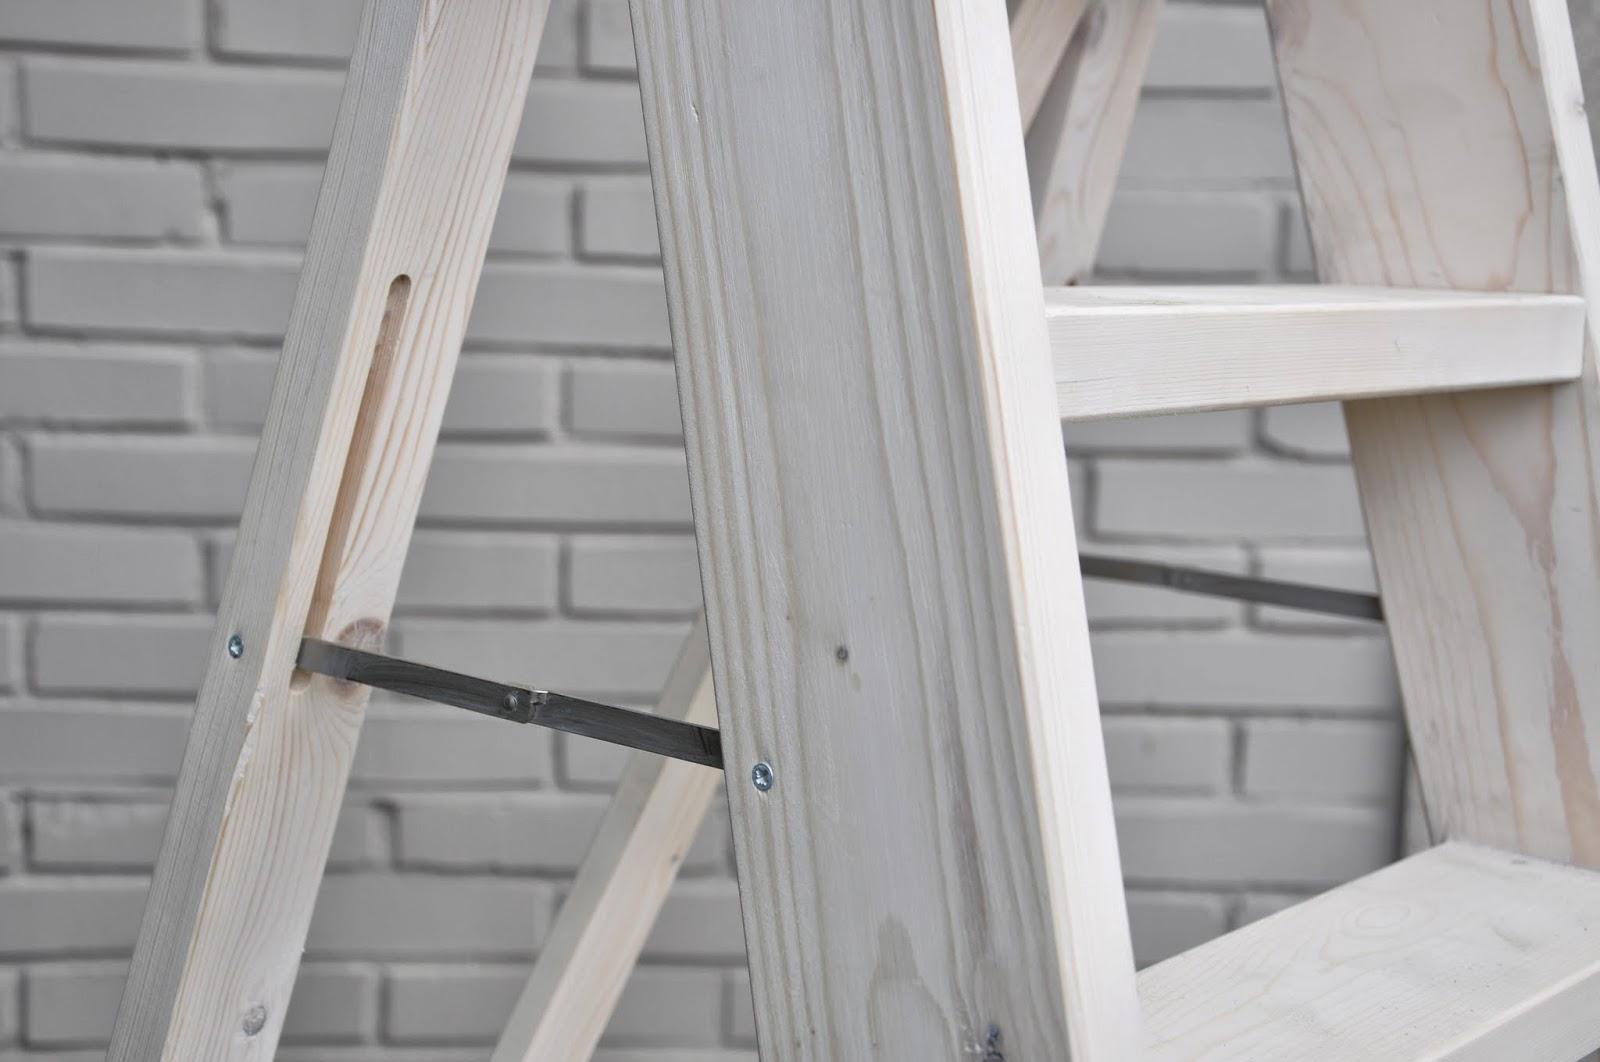 Bekend laddertjes.net #RA13